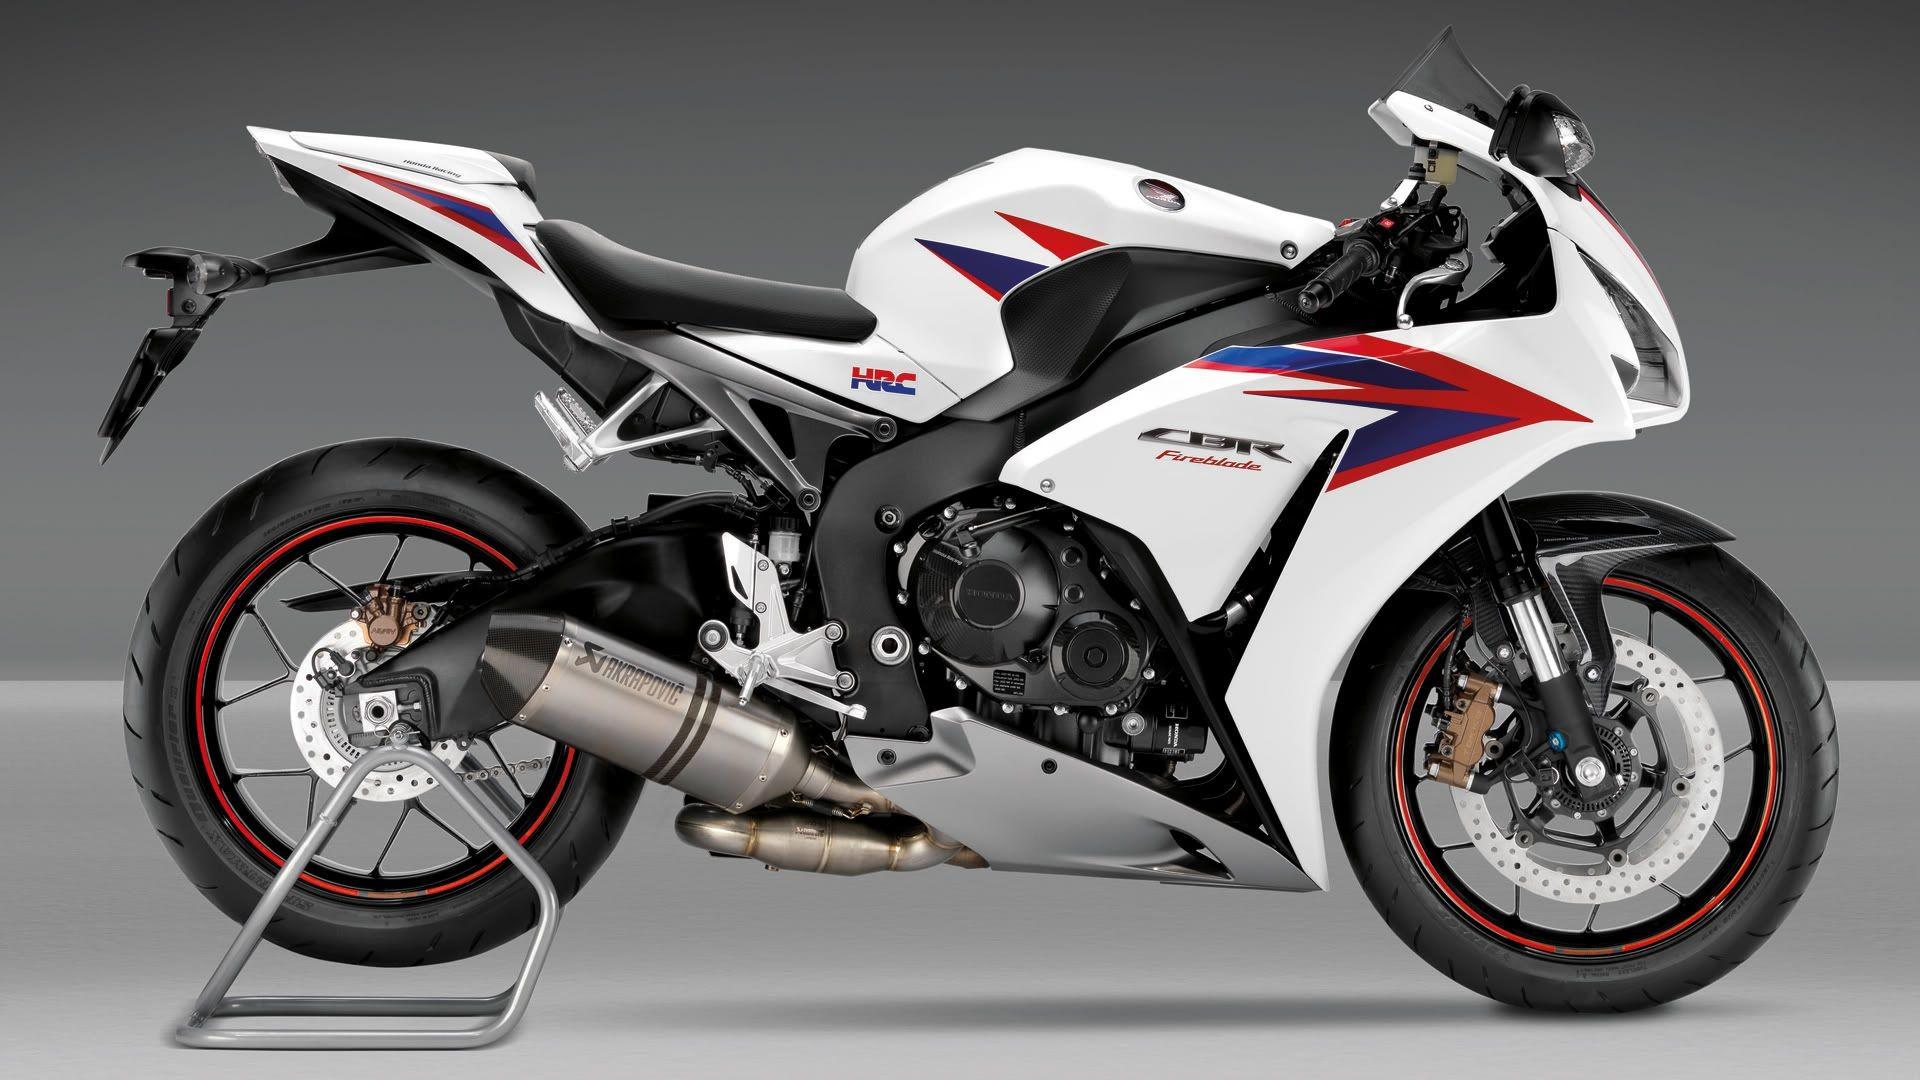 Res: 1920x1080, Honda CBR1000RR 2012 Akrapovic